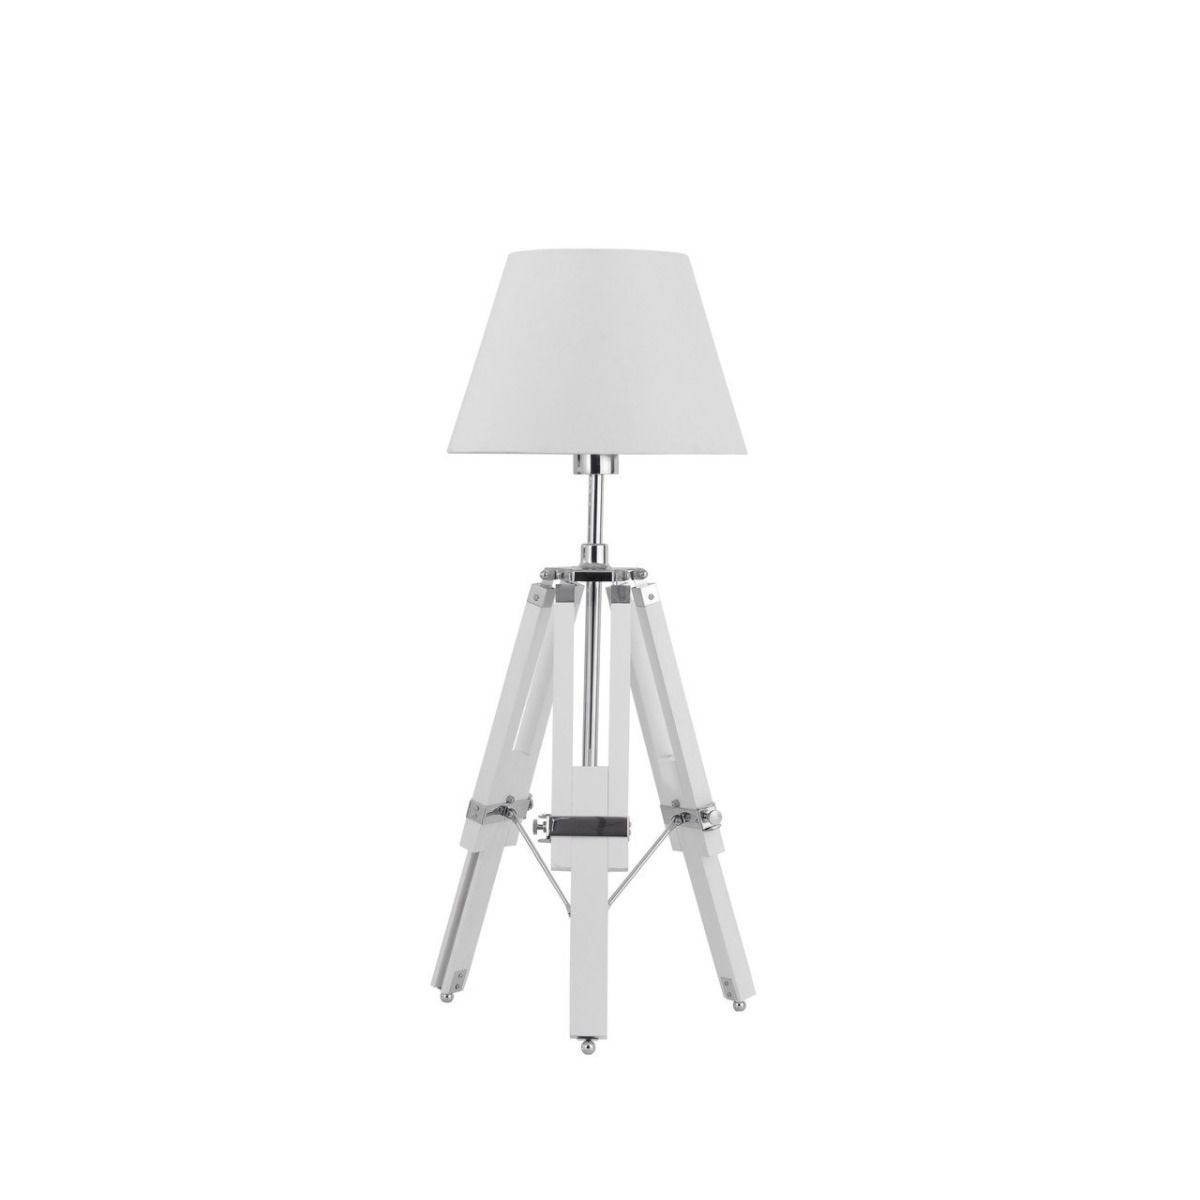 Feature Lamp - White Tripod Base